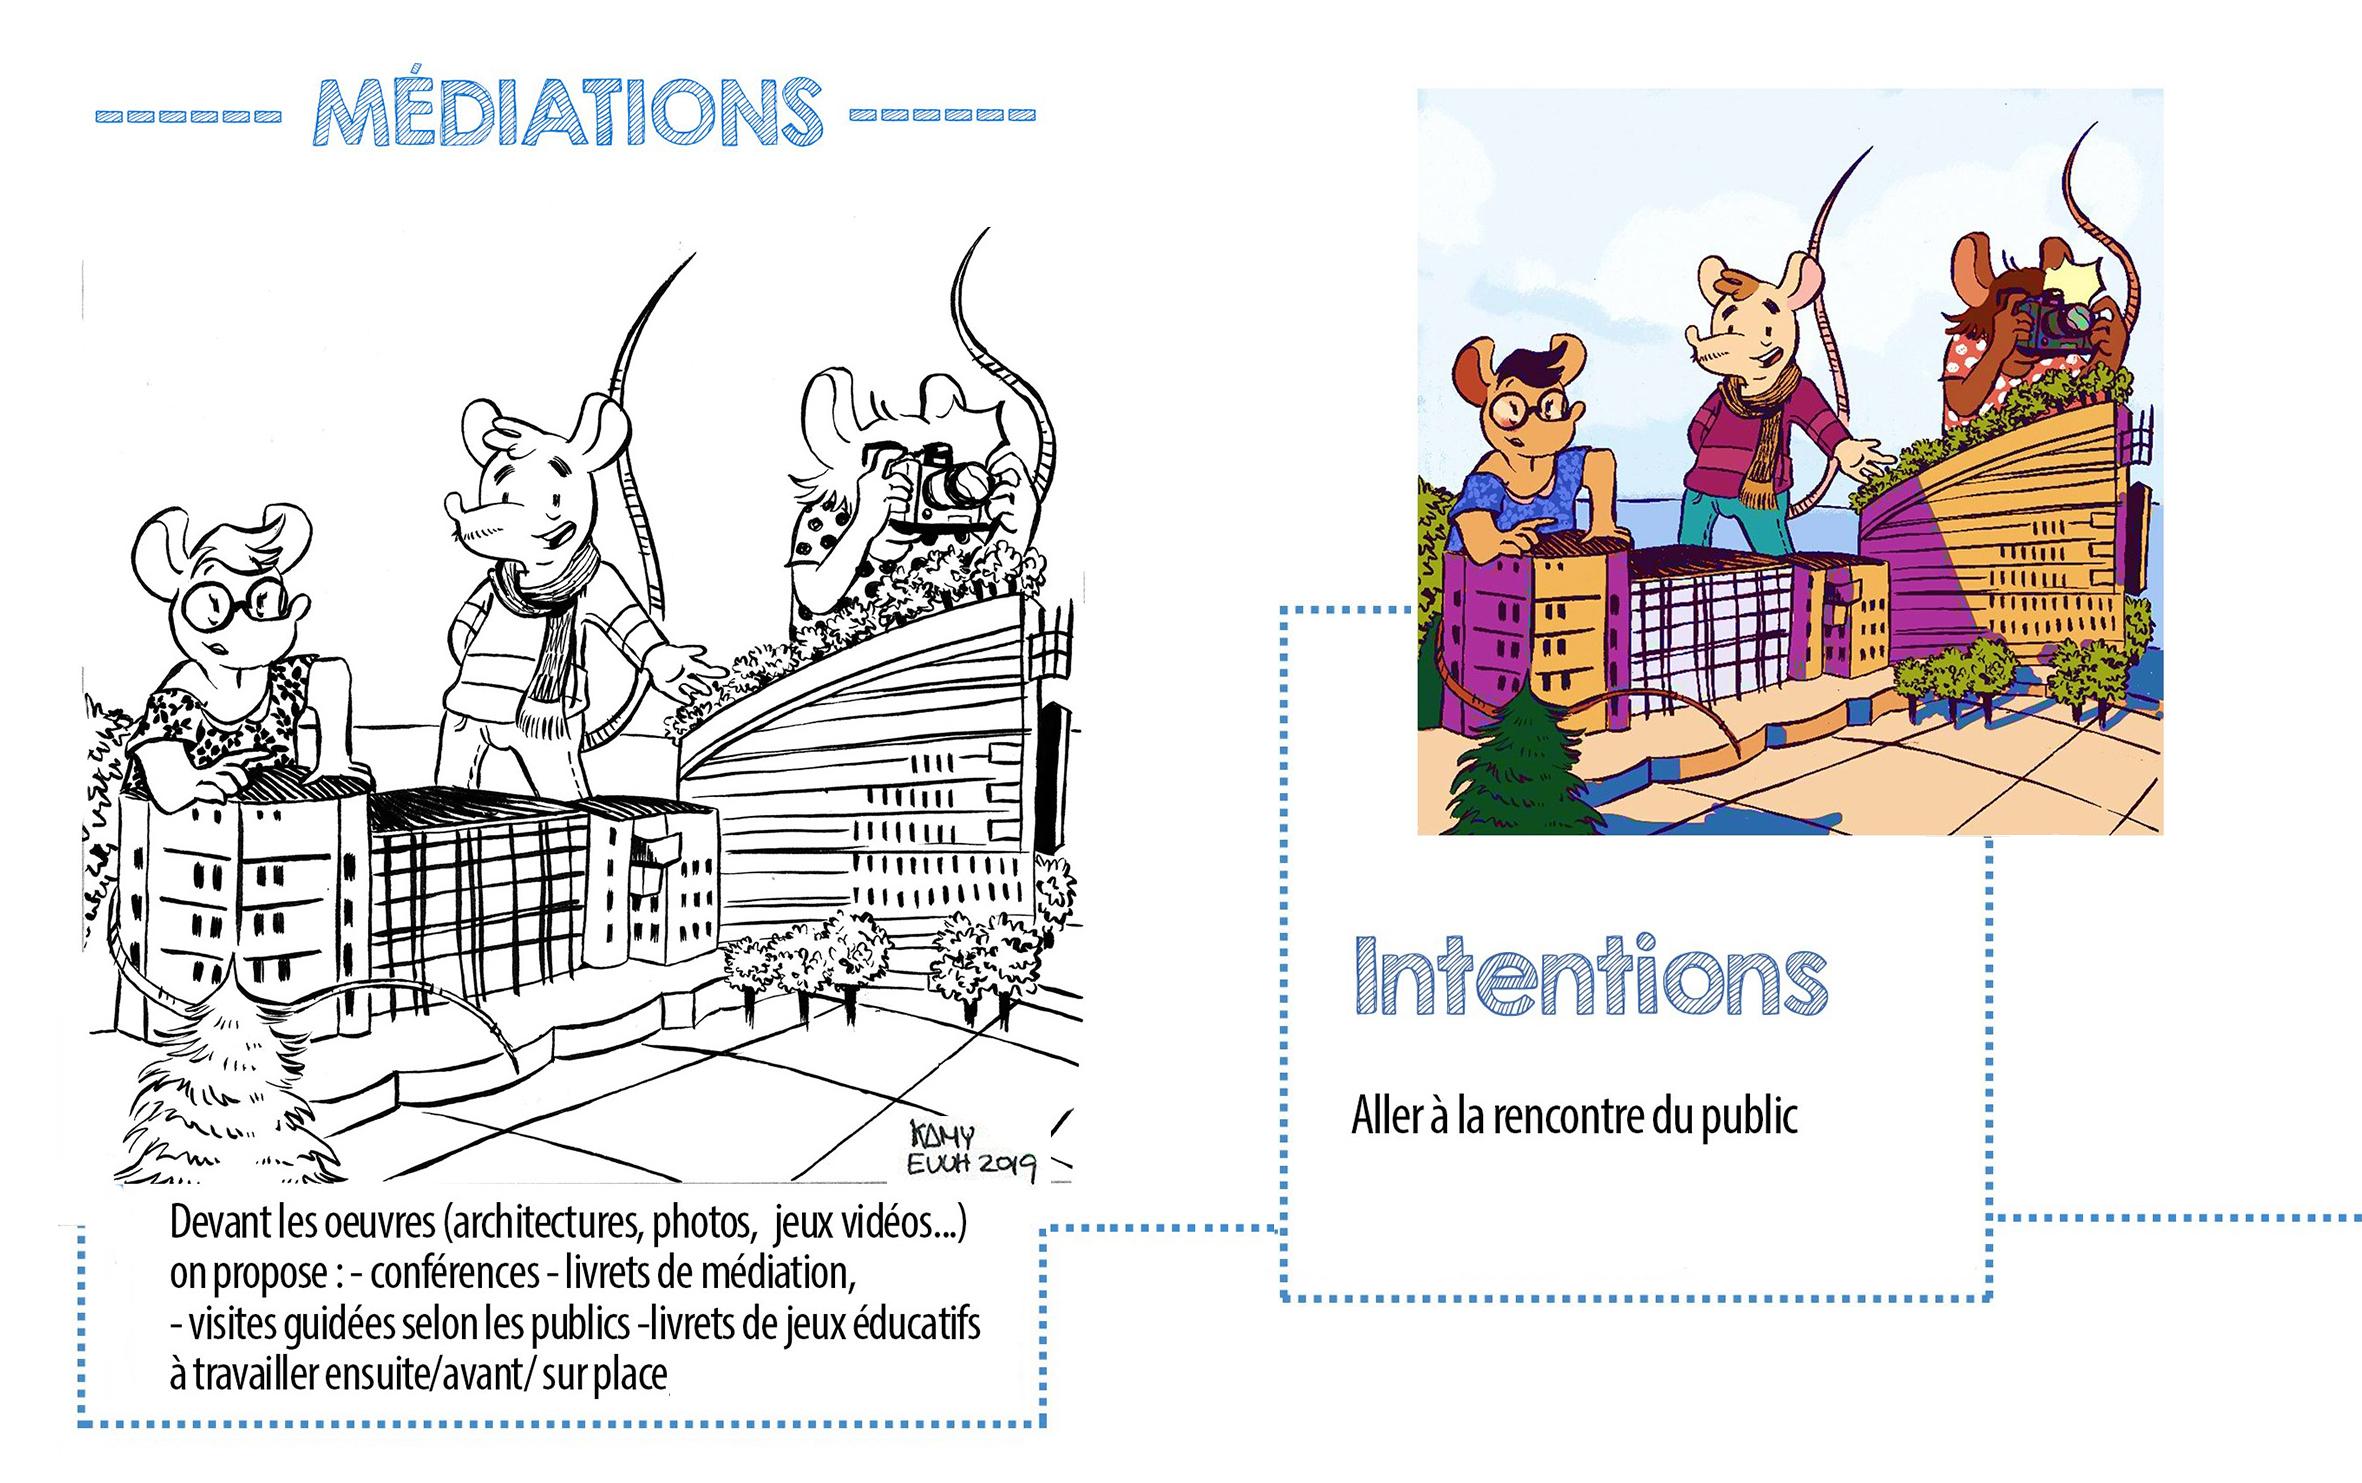 bandeau-Mediations-PREFIGURATIONS-V2-F